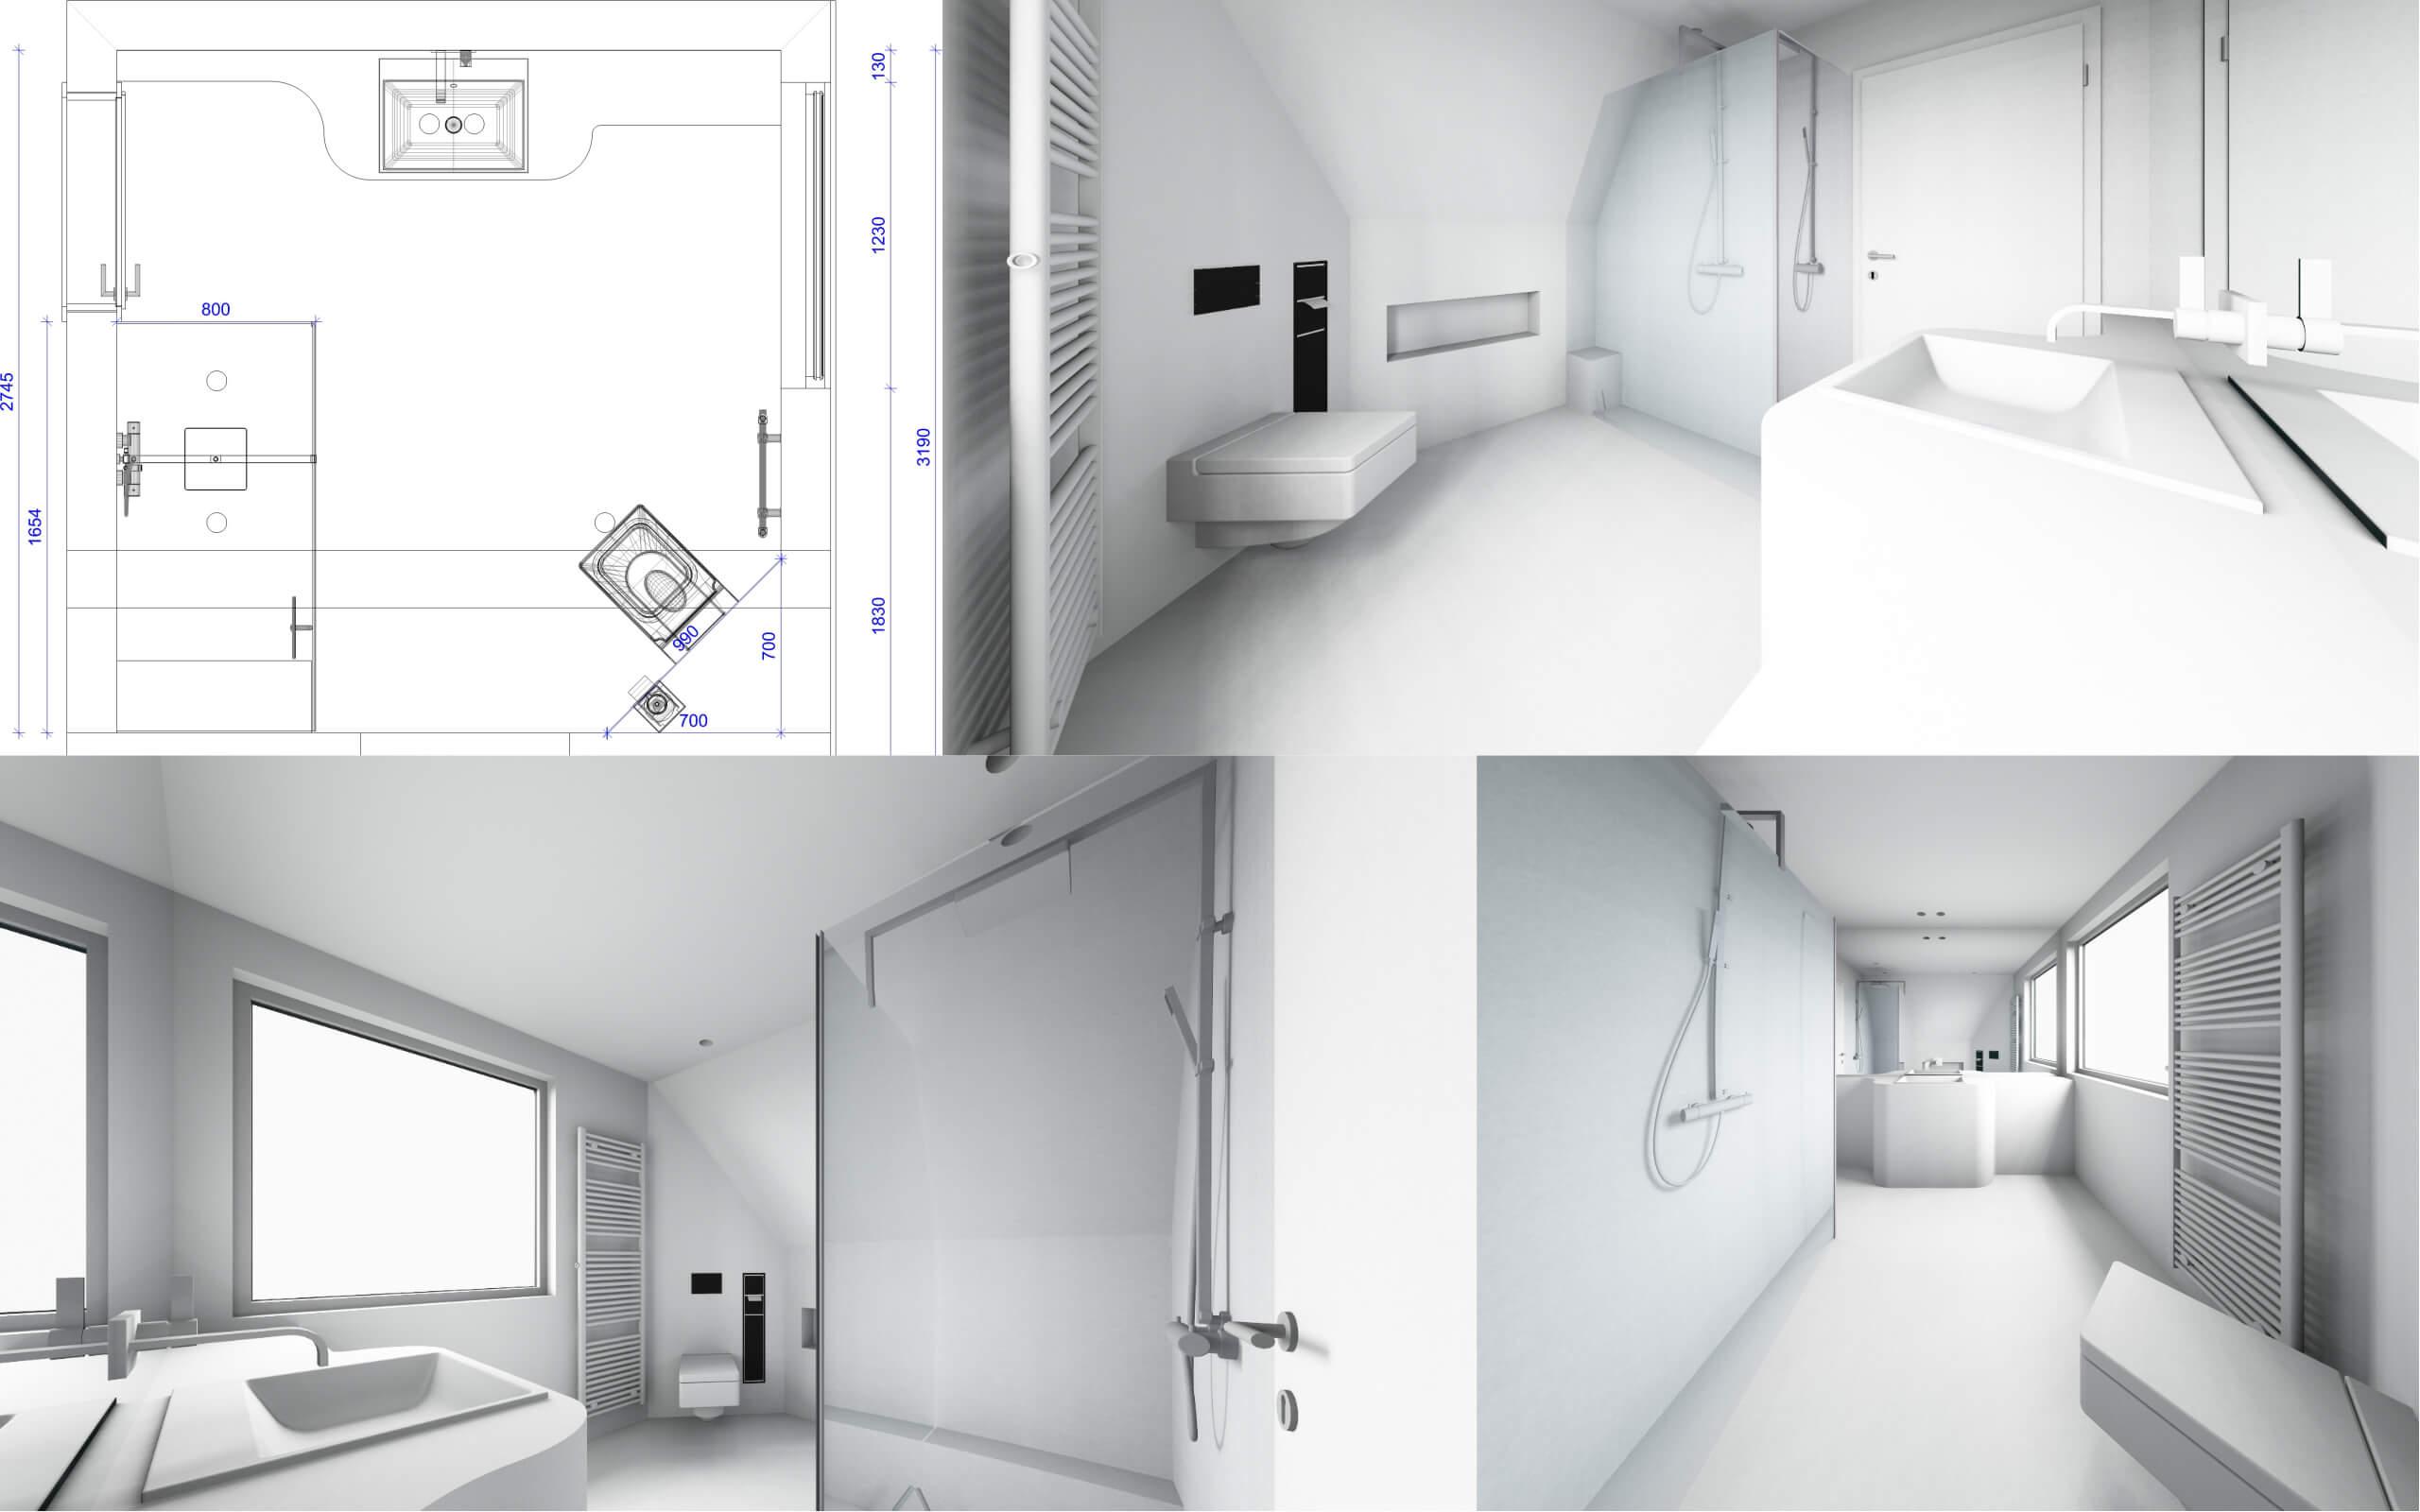 Badplaner Designer Torsten Müller 3D Visualisierung Konzepte Badezimmer Design Bonn Köln Bad Honnef